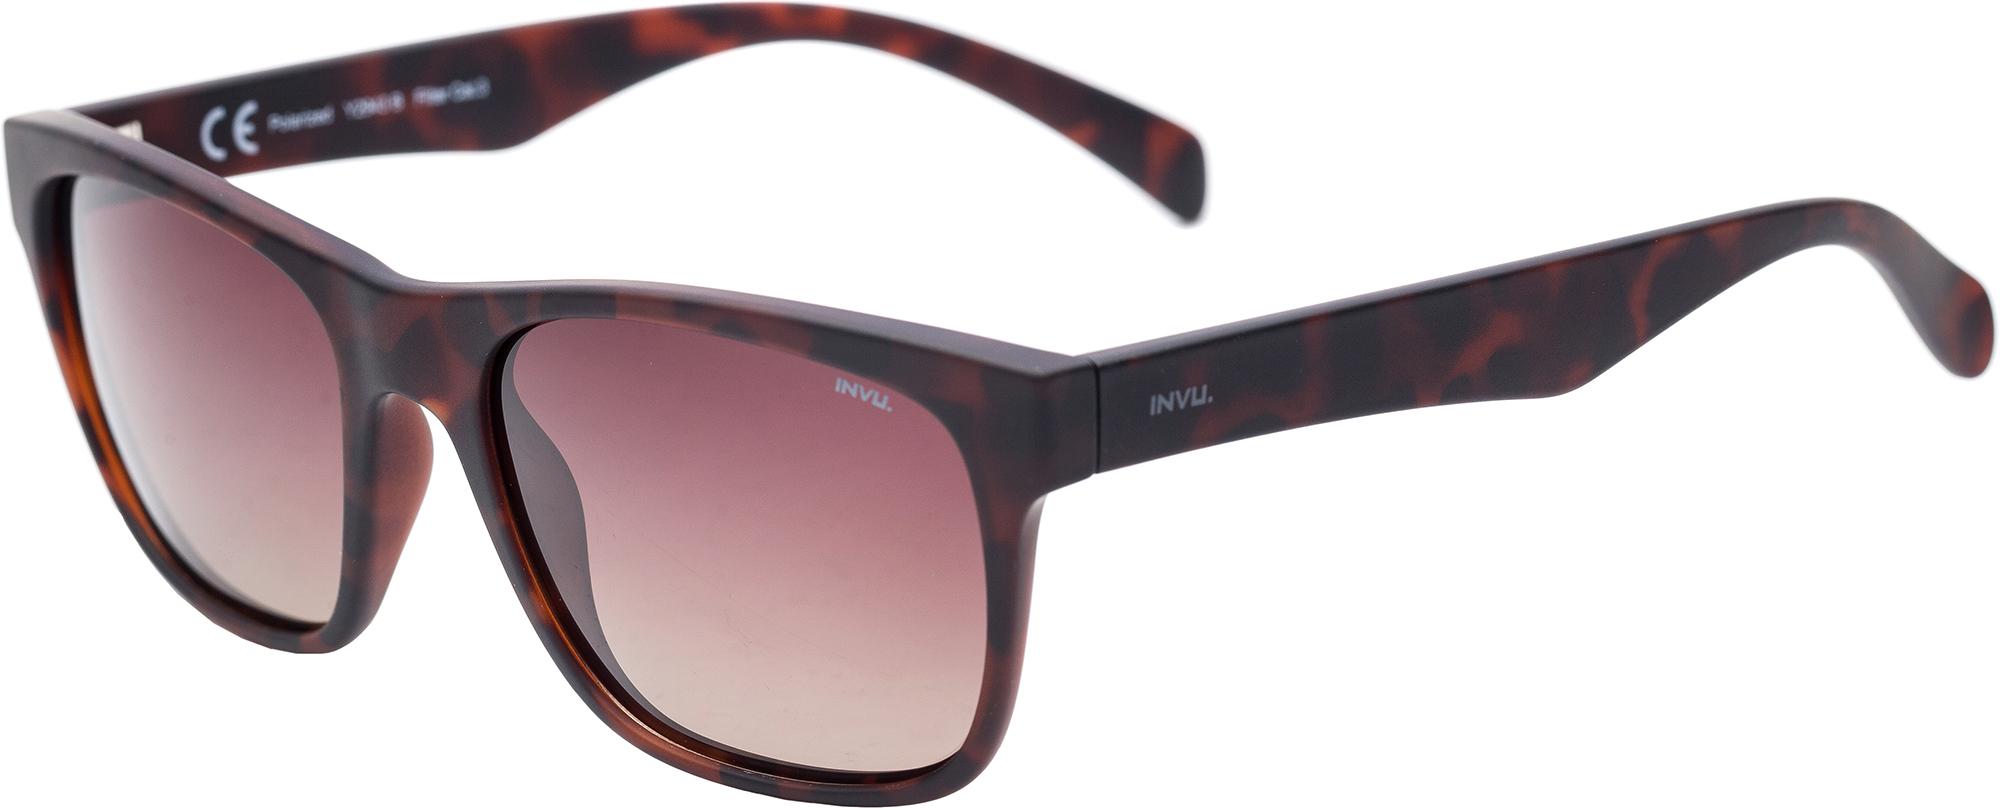 Invu Солнцезащитные очки Invu